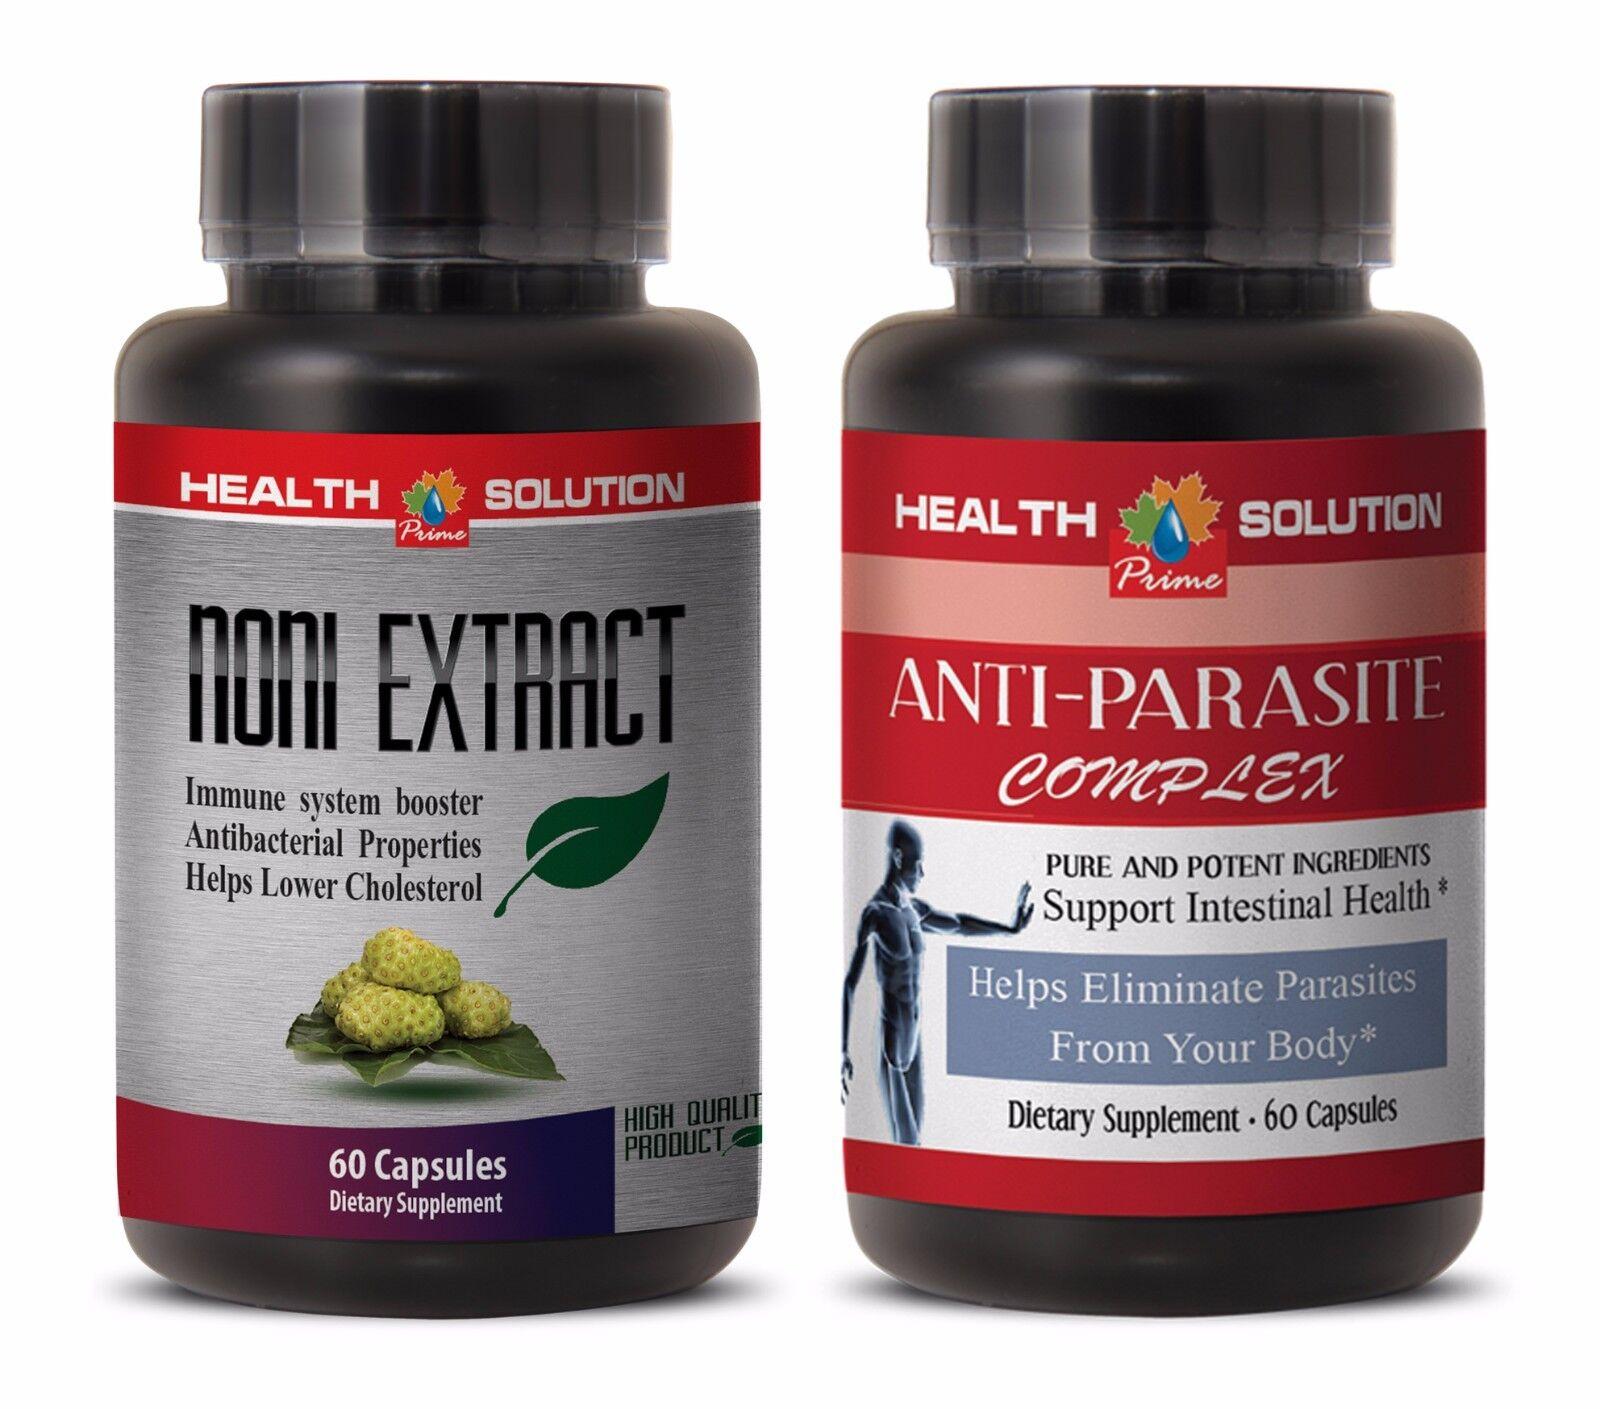 Parasite and colon cleanse - NONI – ANTI PARASITE COMBO -